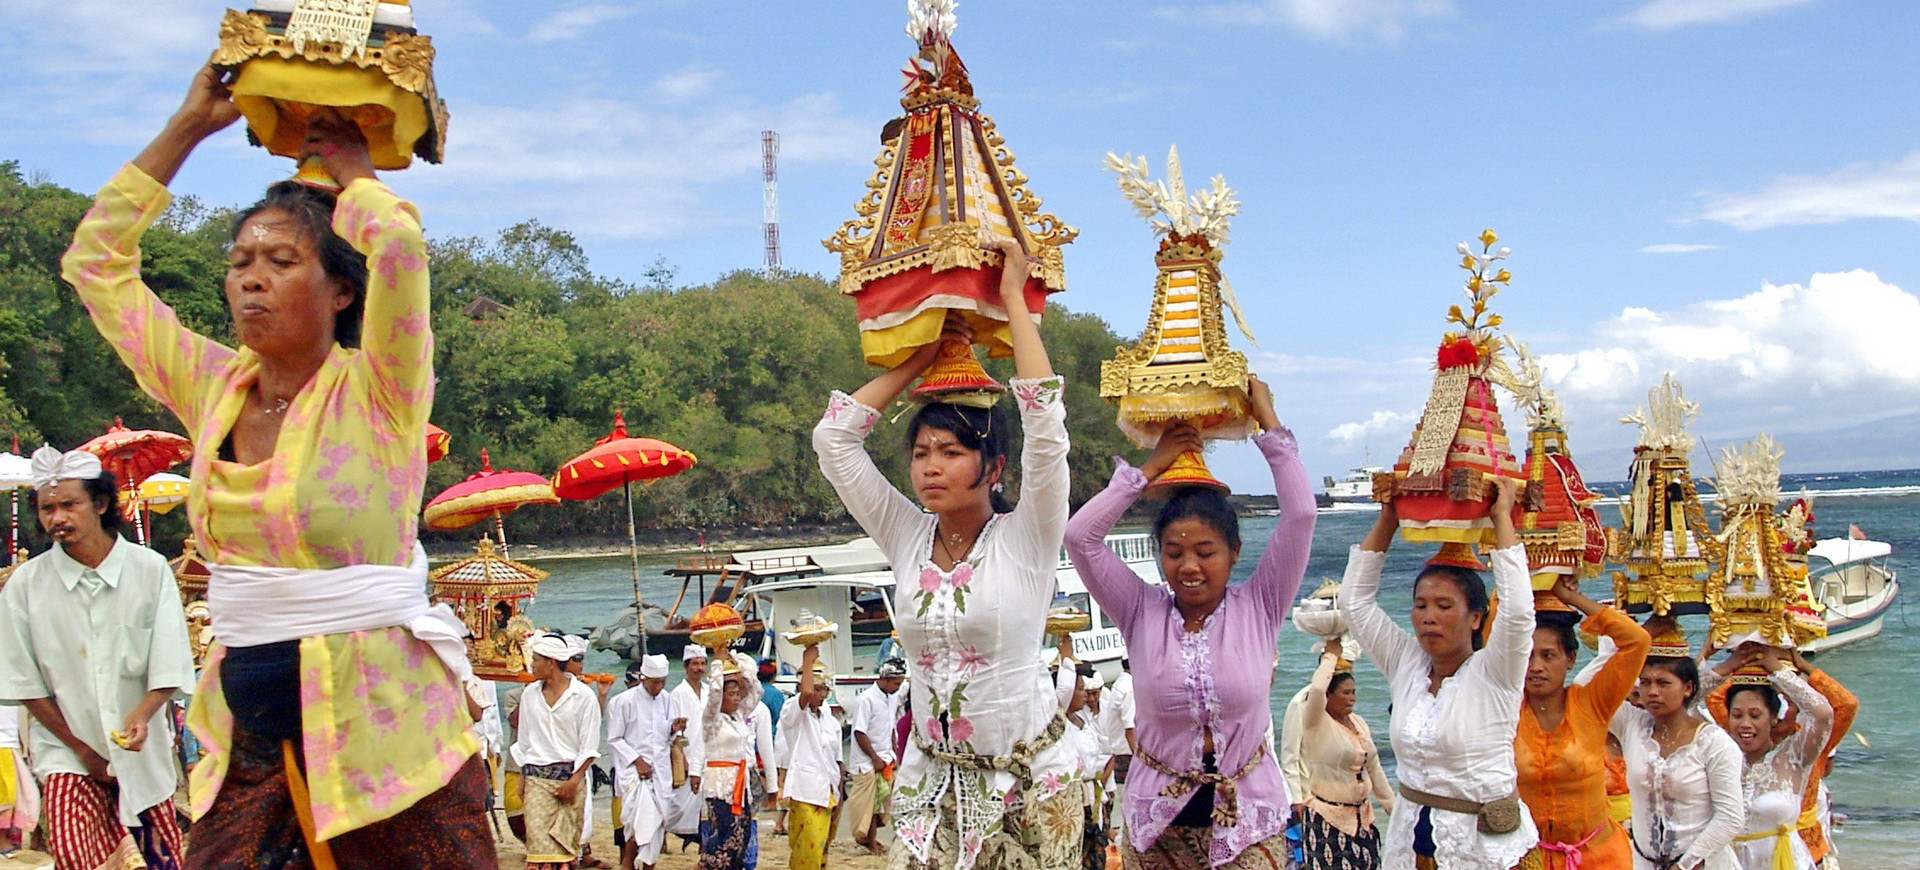 Indonésie Bali Offerandes aux Dieux